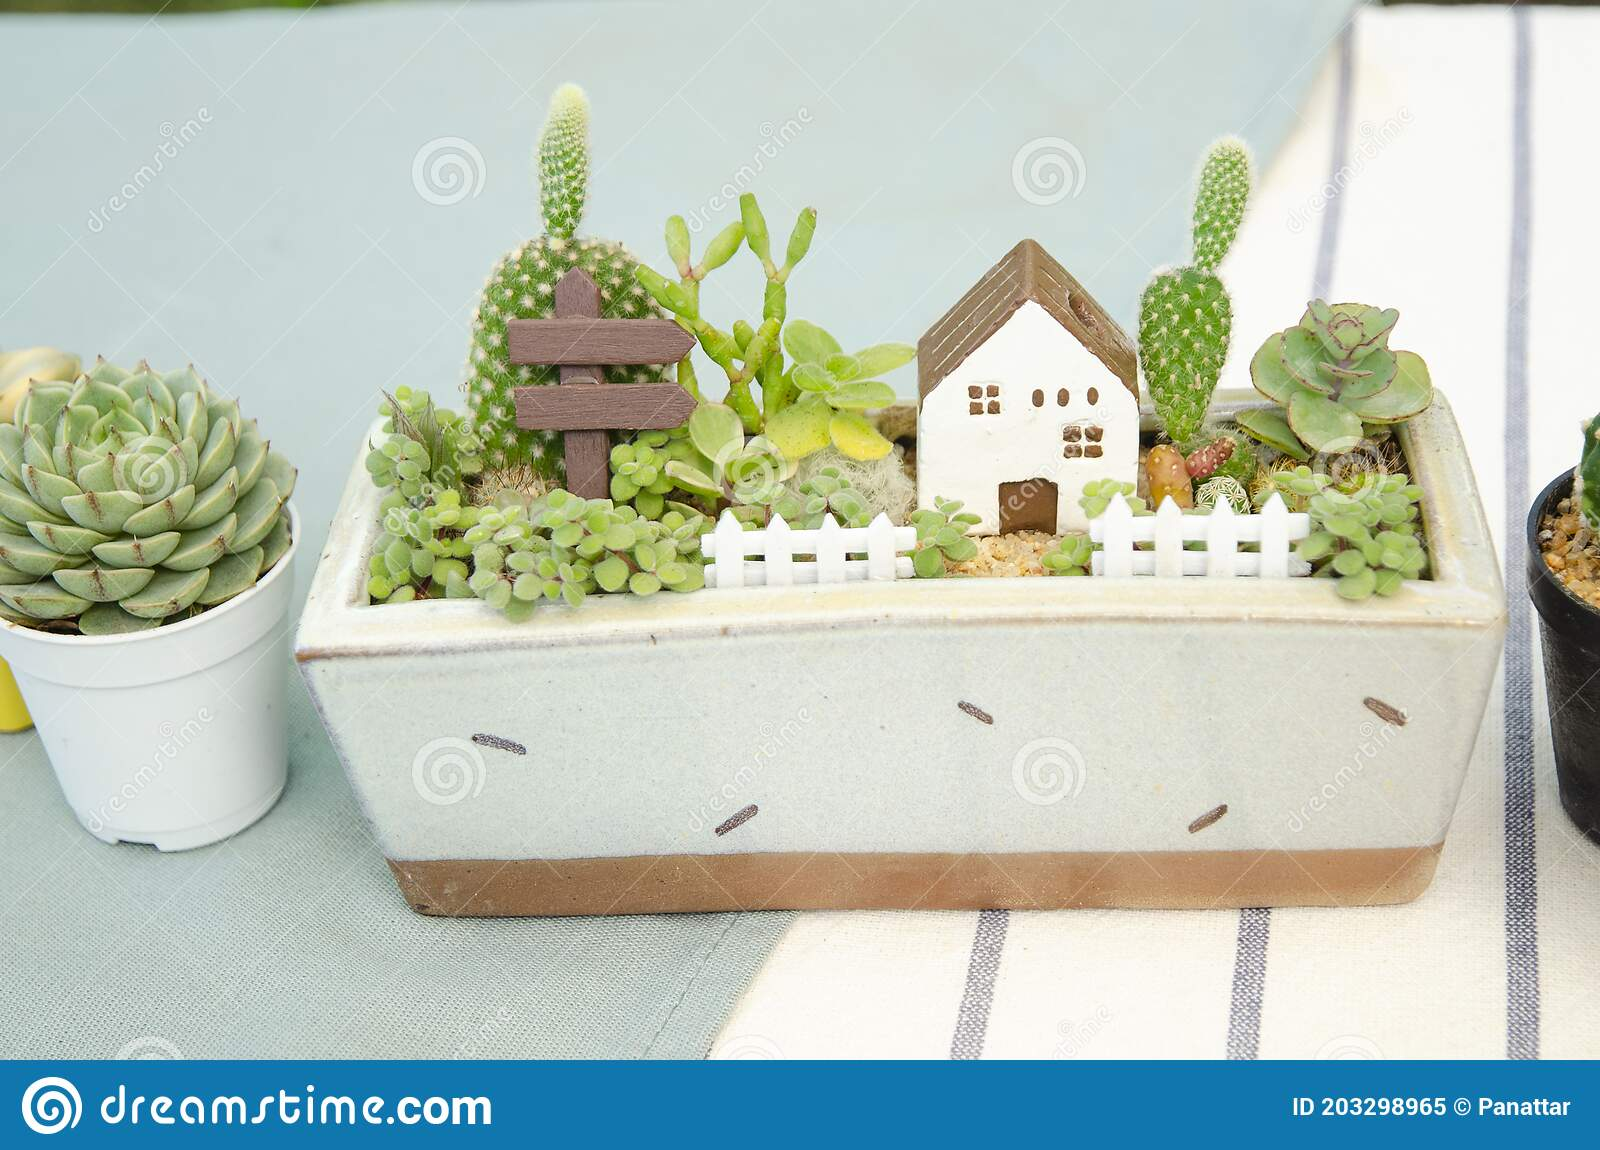 Mix Of Cactus And Succulent Plant Arrangement With House Miniature Fairy Terrarium Stock Image Image Of Green Color 203298965